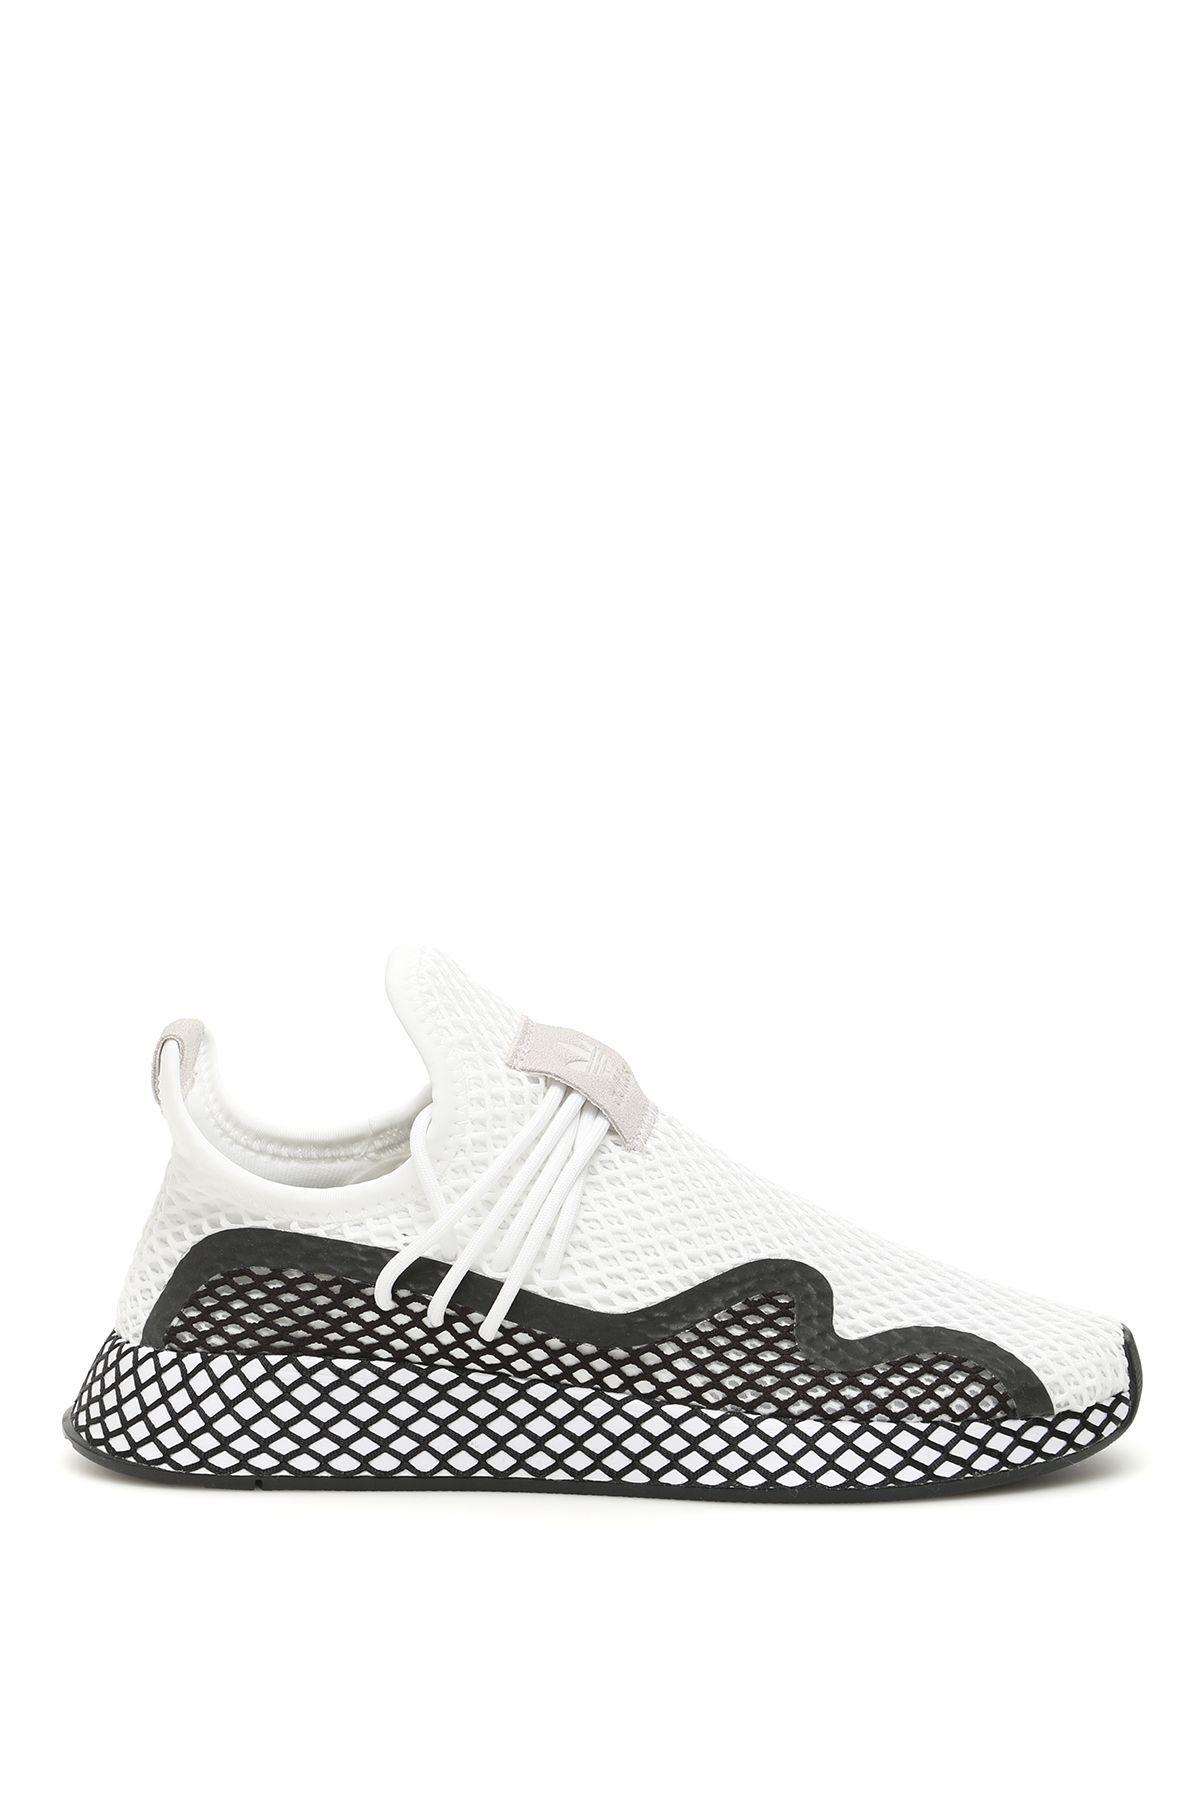 size 40 1344d 9bae6 ADIDAS ORIGINALS DEERUPT S SNEAKERS.  adidasoriginals  shoes